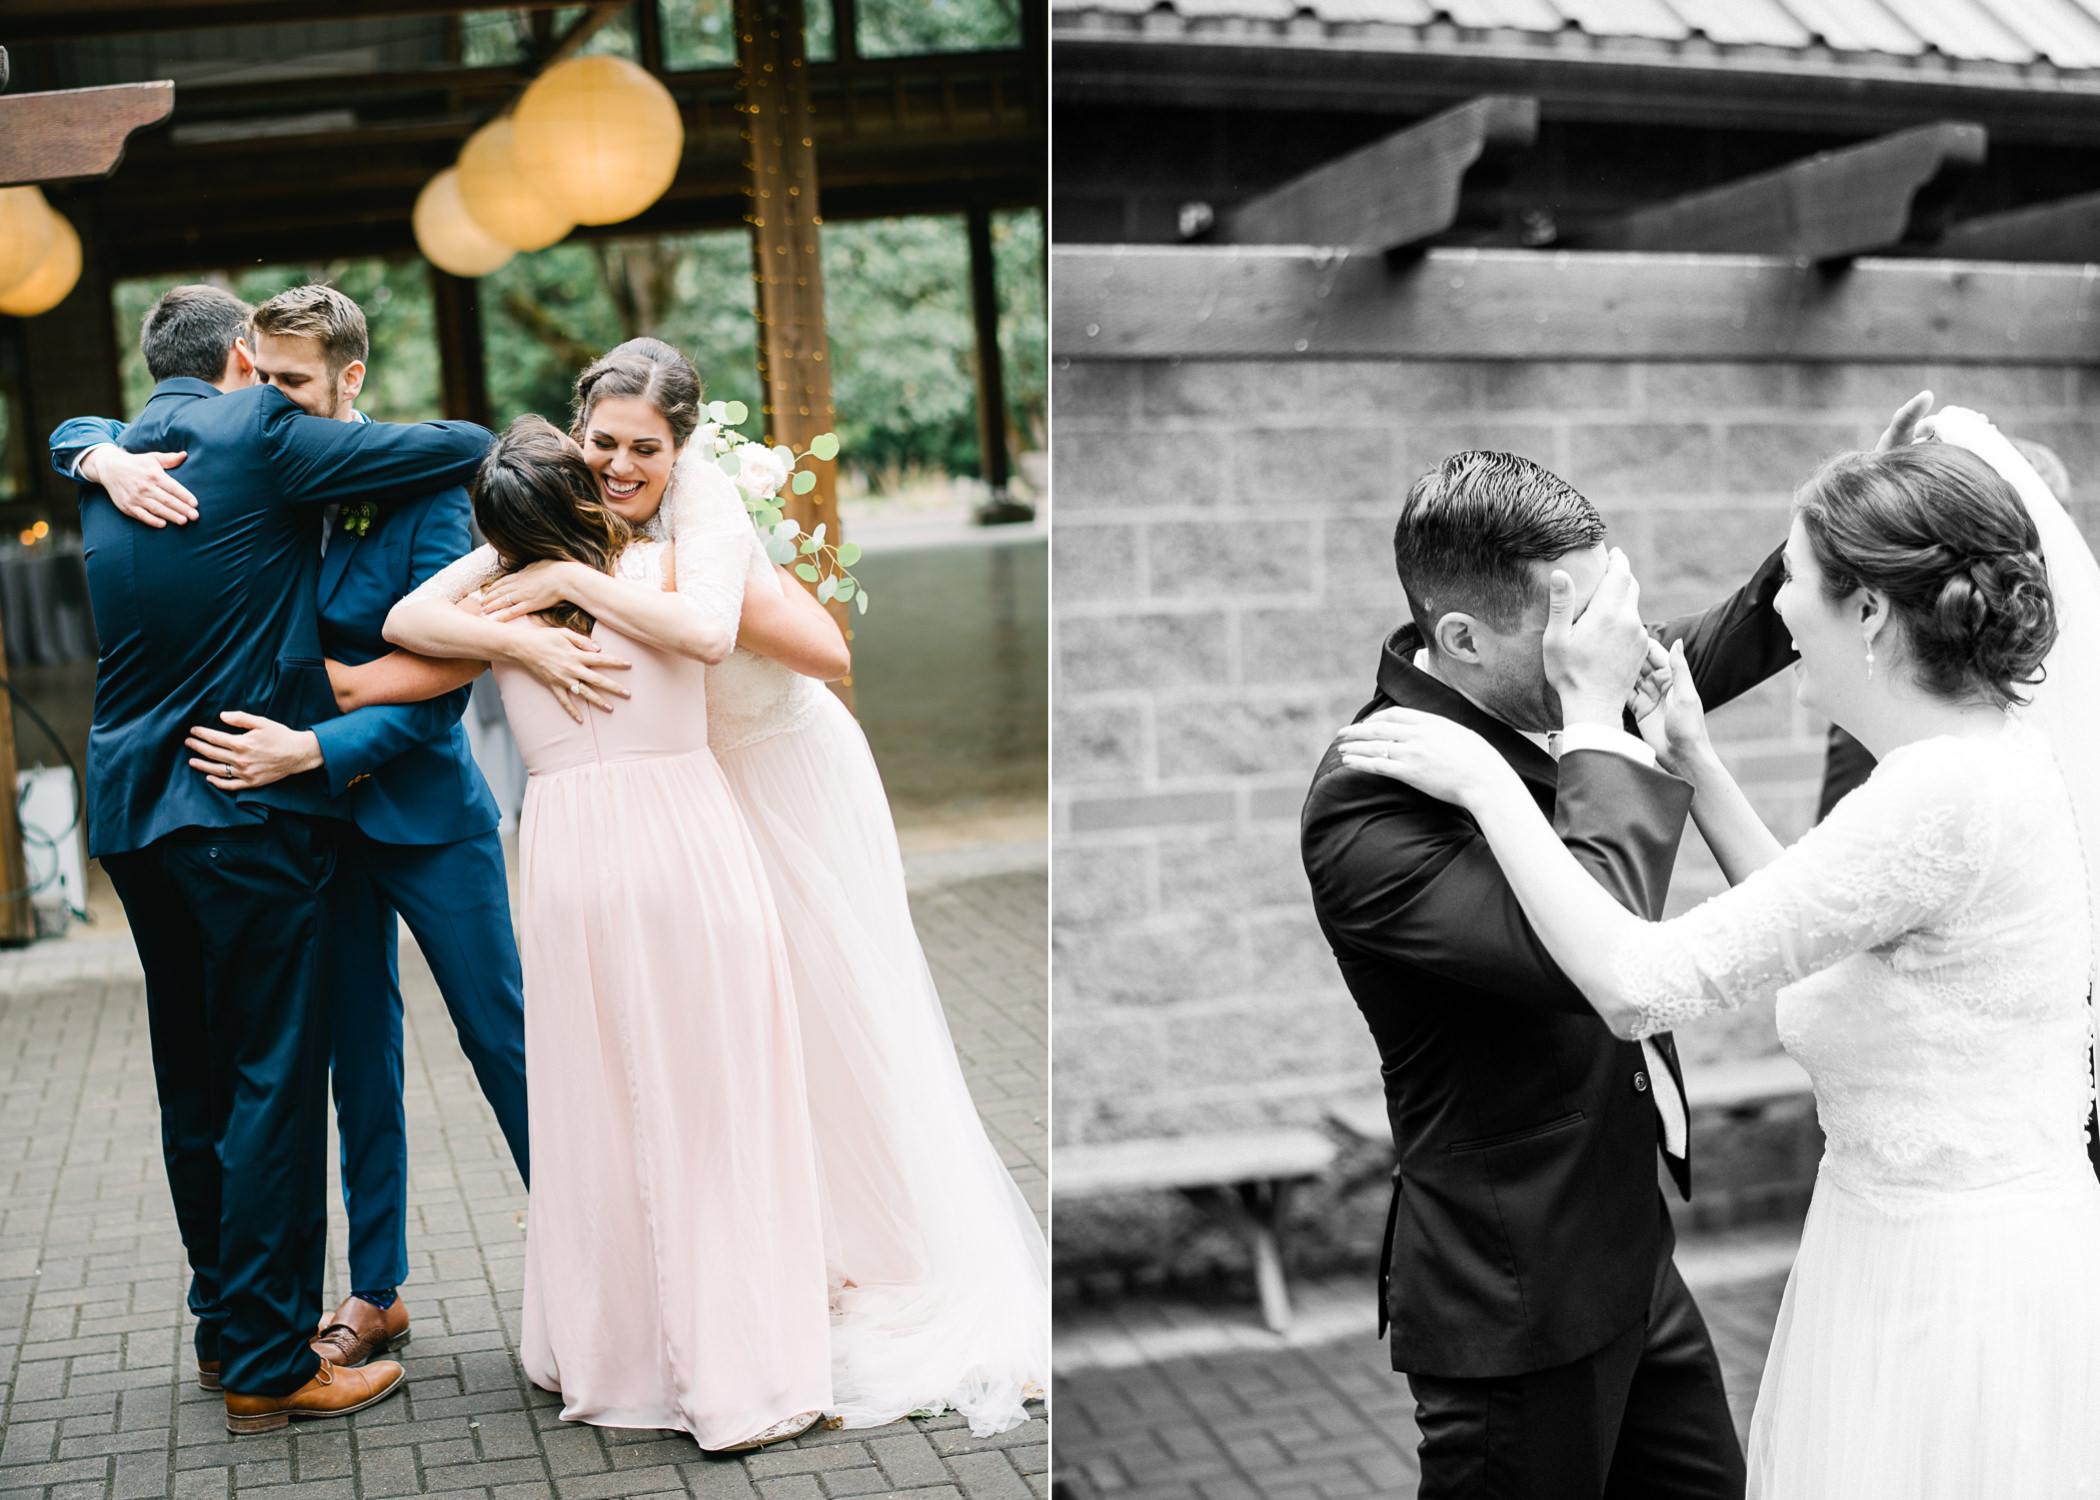 mt-pisgah-oregon-september-wedding-102a.jpg